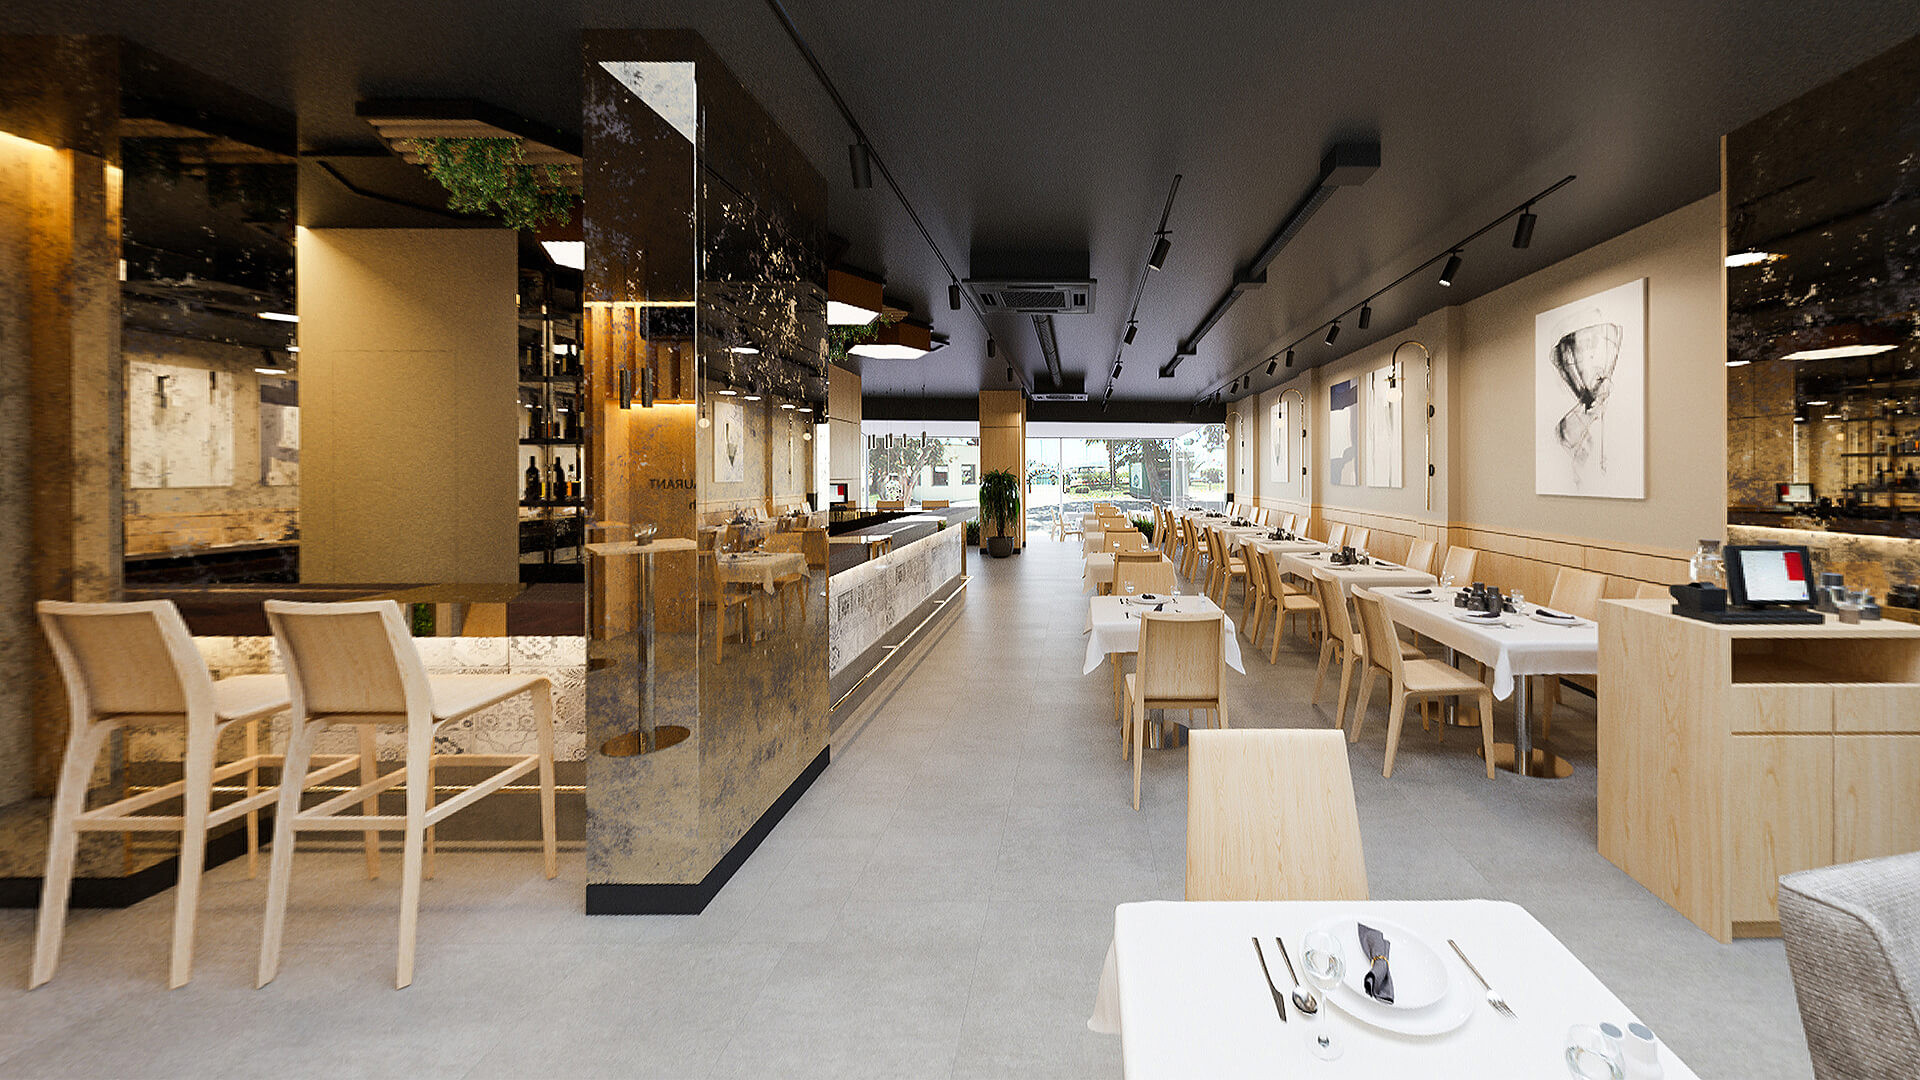 moya-restaurant-interior-design-3.jpg